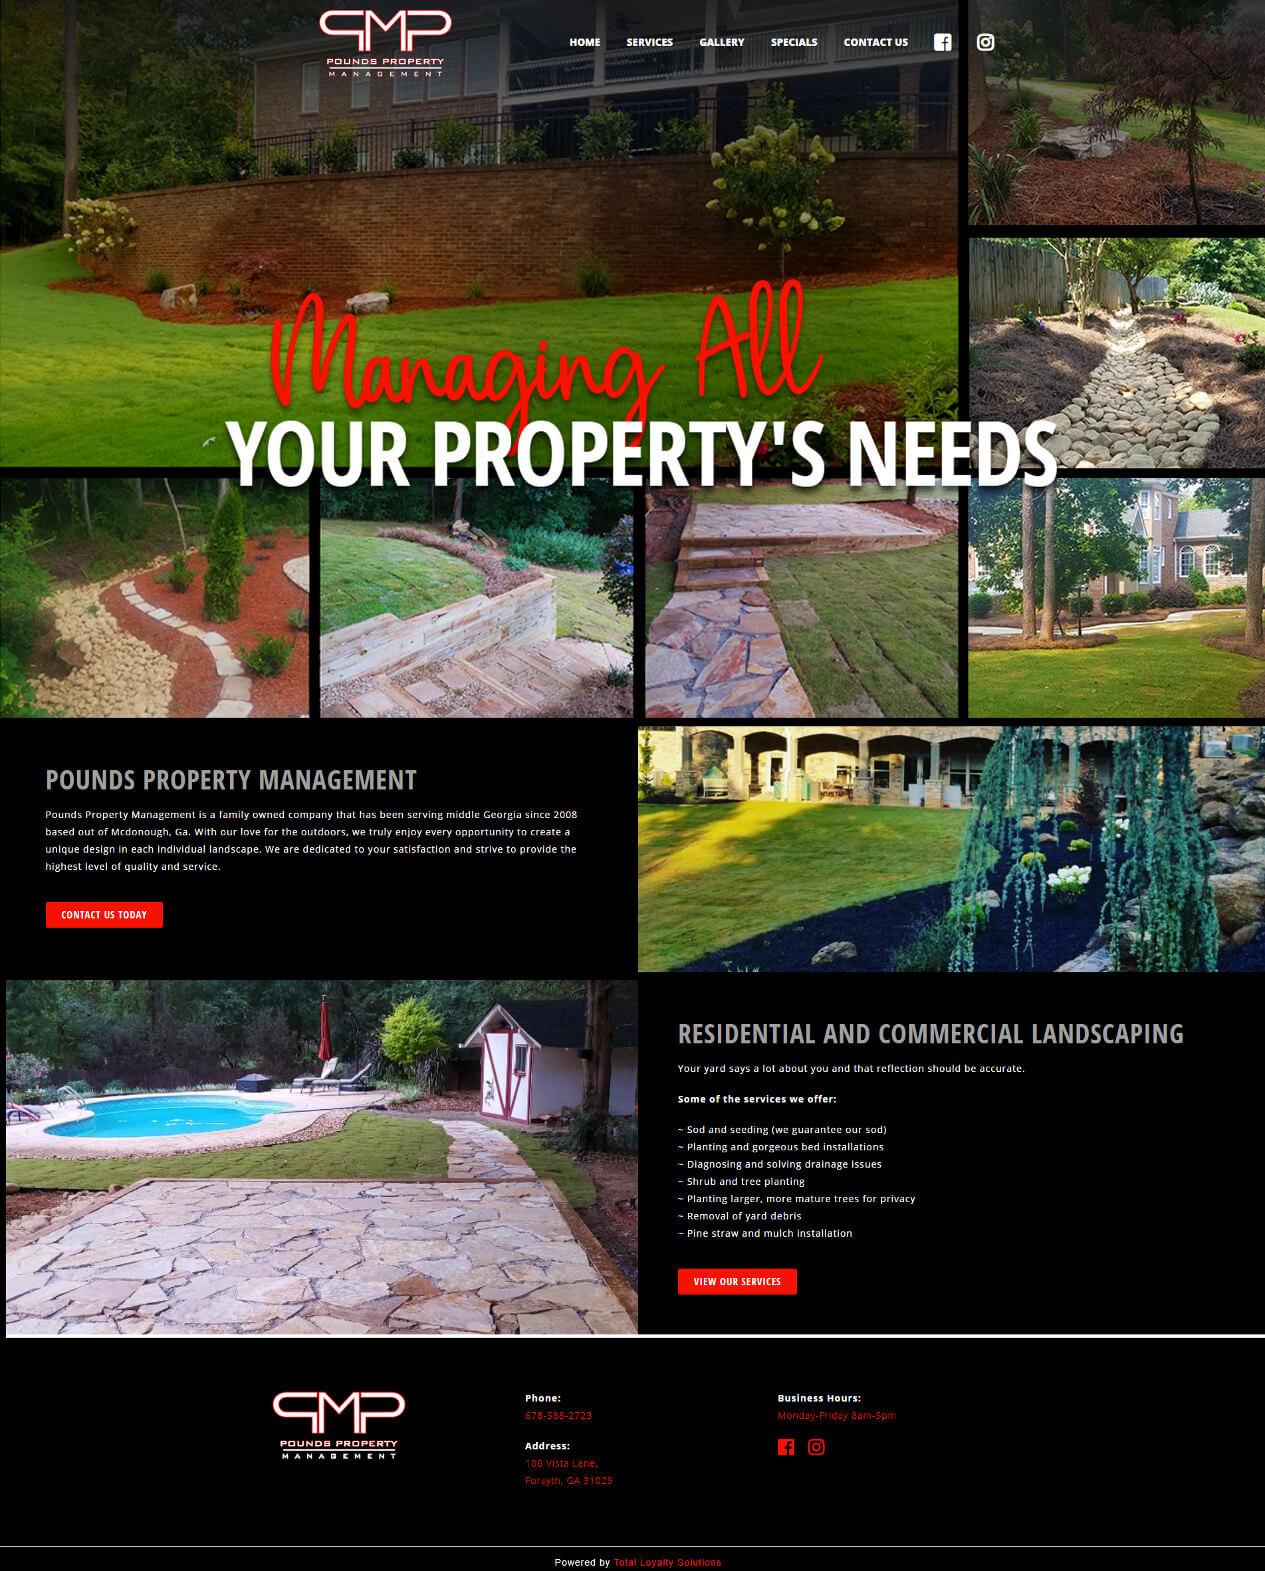 Pounds Property Management - TLS Mobile Friendly Website